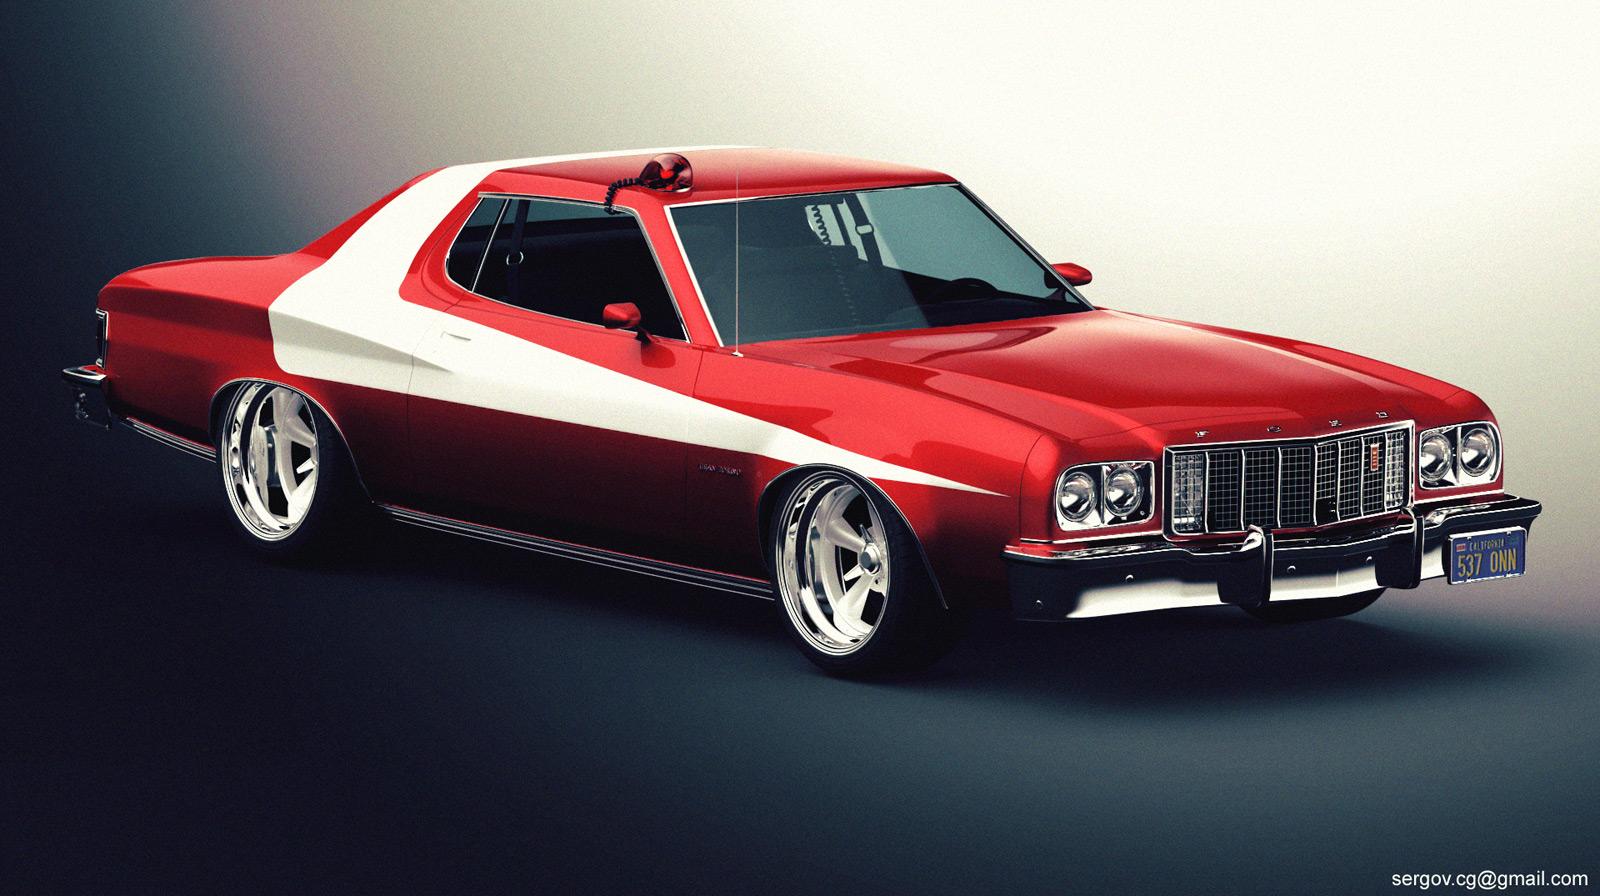 sergoc58 65 11 ford gran torino studio by sergoc58 - Ford Gran Torino